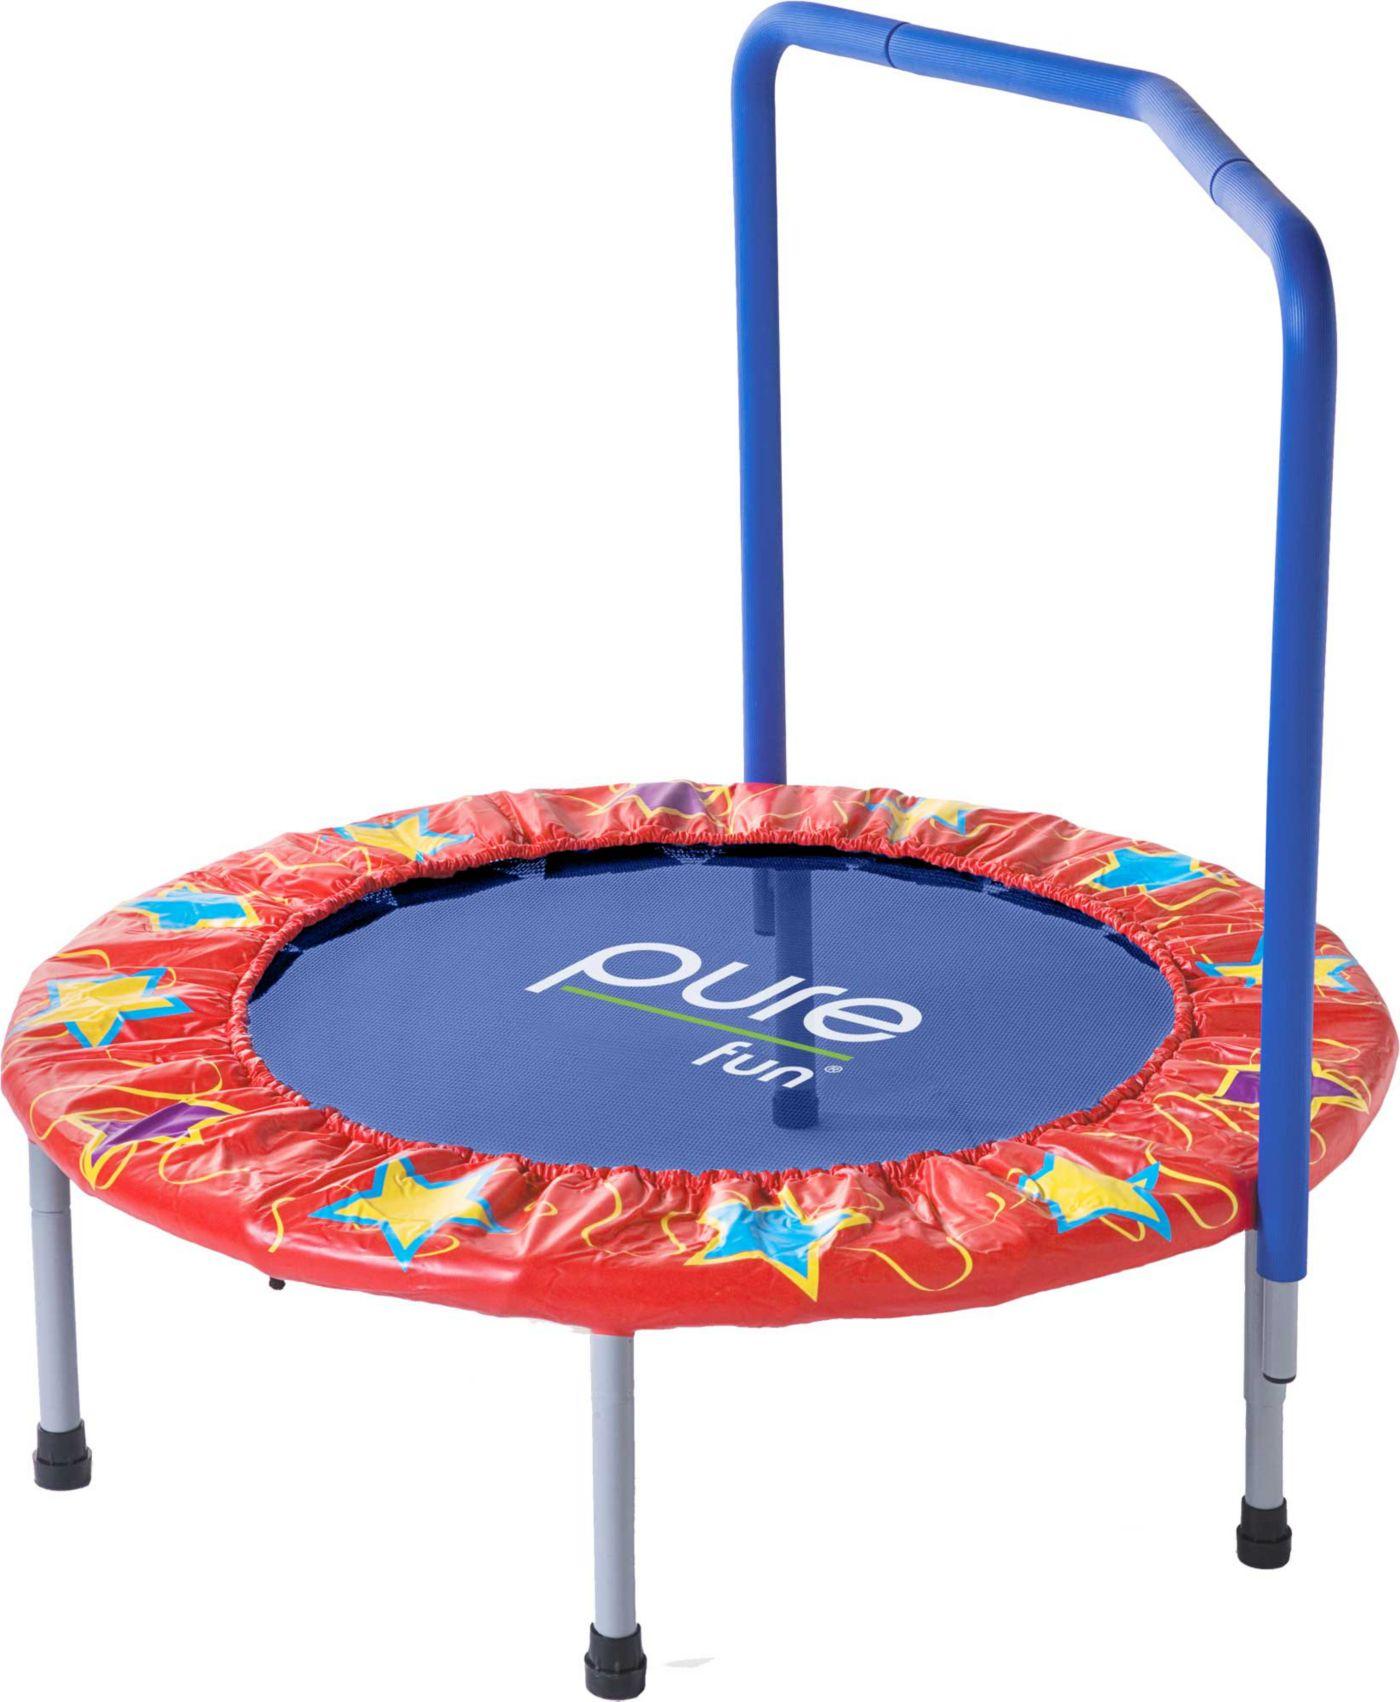 "Pure Fun 36"" Kids Trampoline with Handrail"